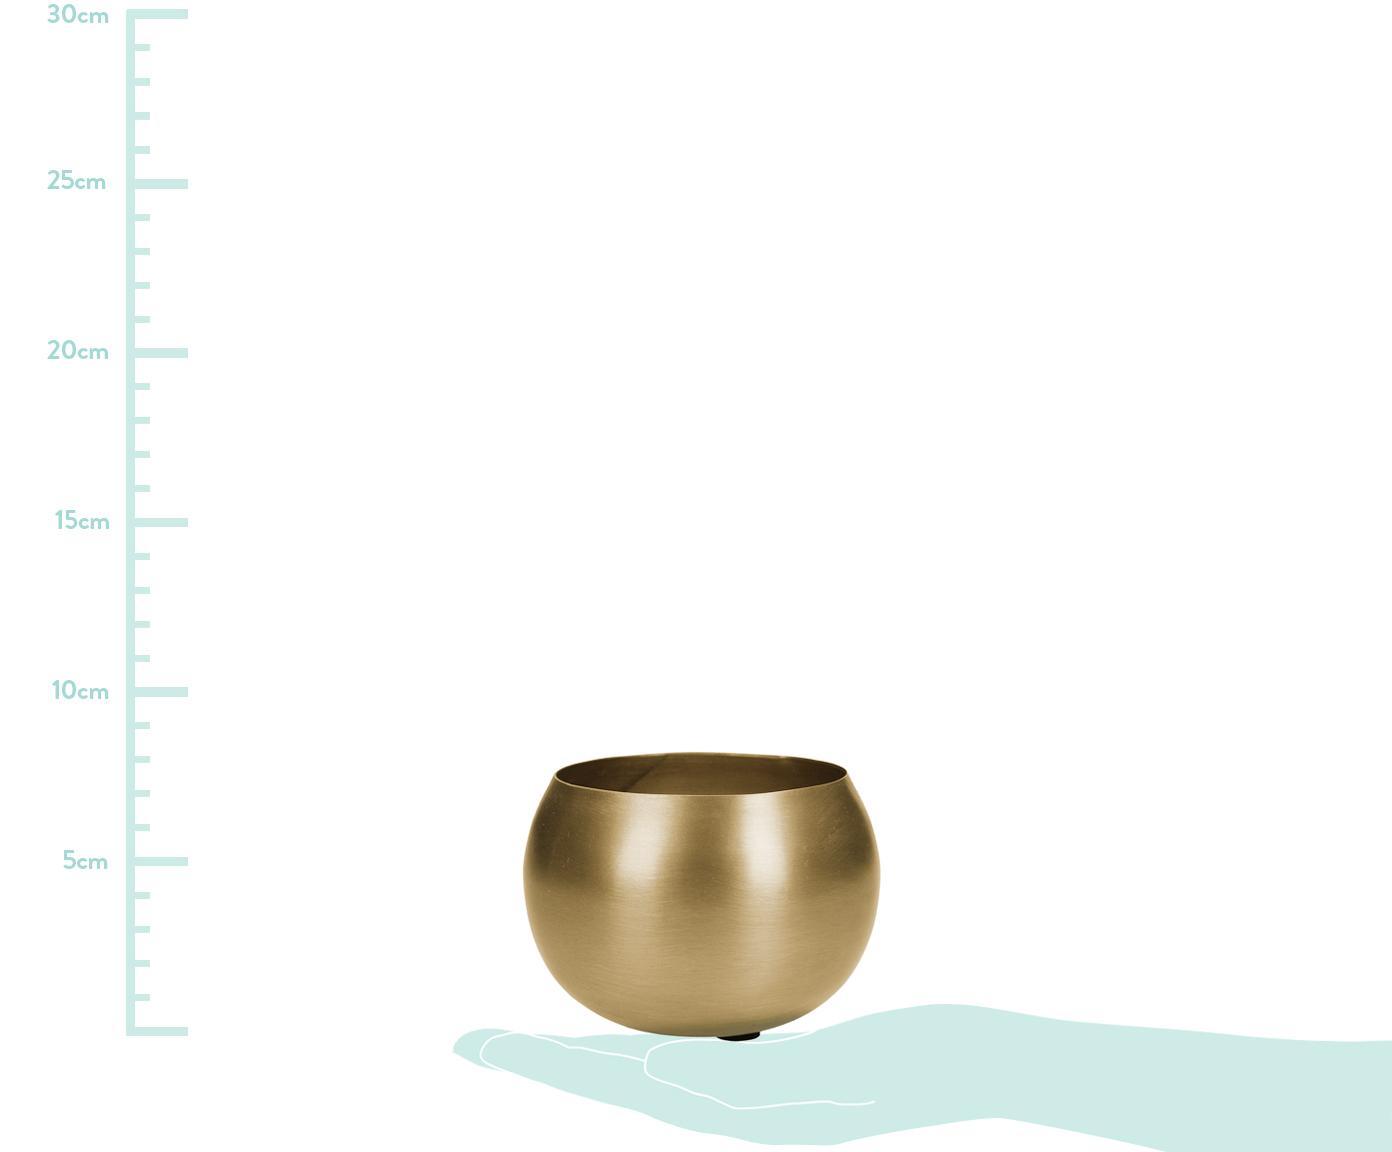 Portavaso Pat, Metallo rivestito, Ottonato, Ø 10 x Alt. 7 cm